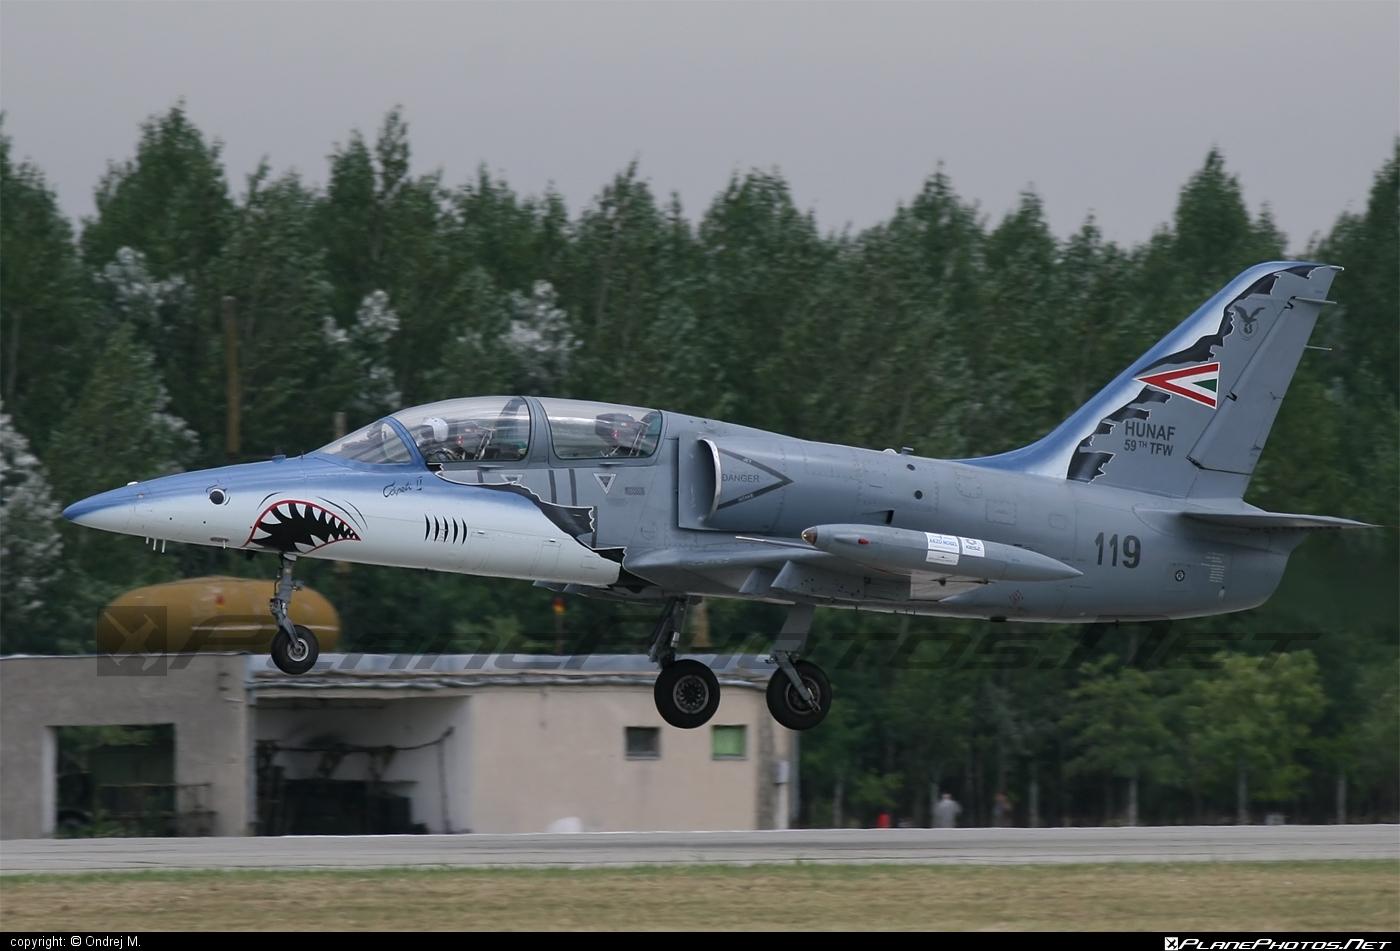 Aero L-39ZO Albatros - 119 operated by Magyar Légierő (Hungarian Air Force) #aero #aerol39 #aerol39albatros #aerol39zoalbatros #albatros #hungarianairforce #l39 #l39zo #l39zoalbatros #magyarlegiero